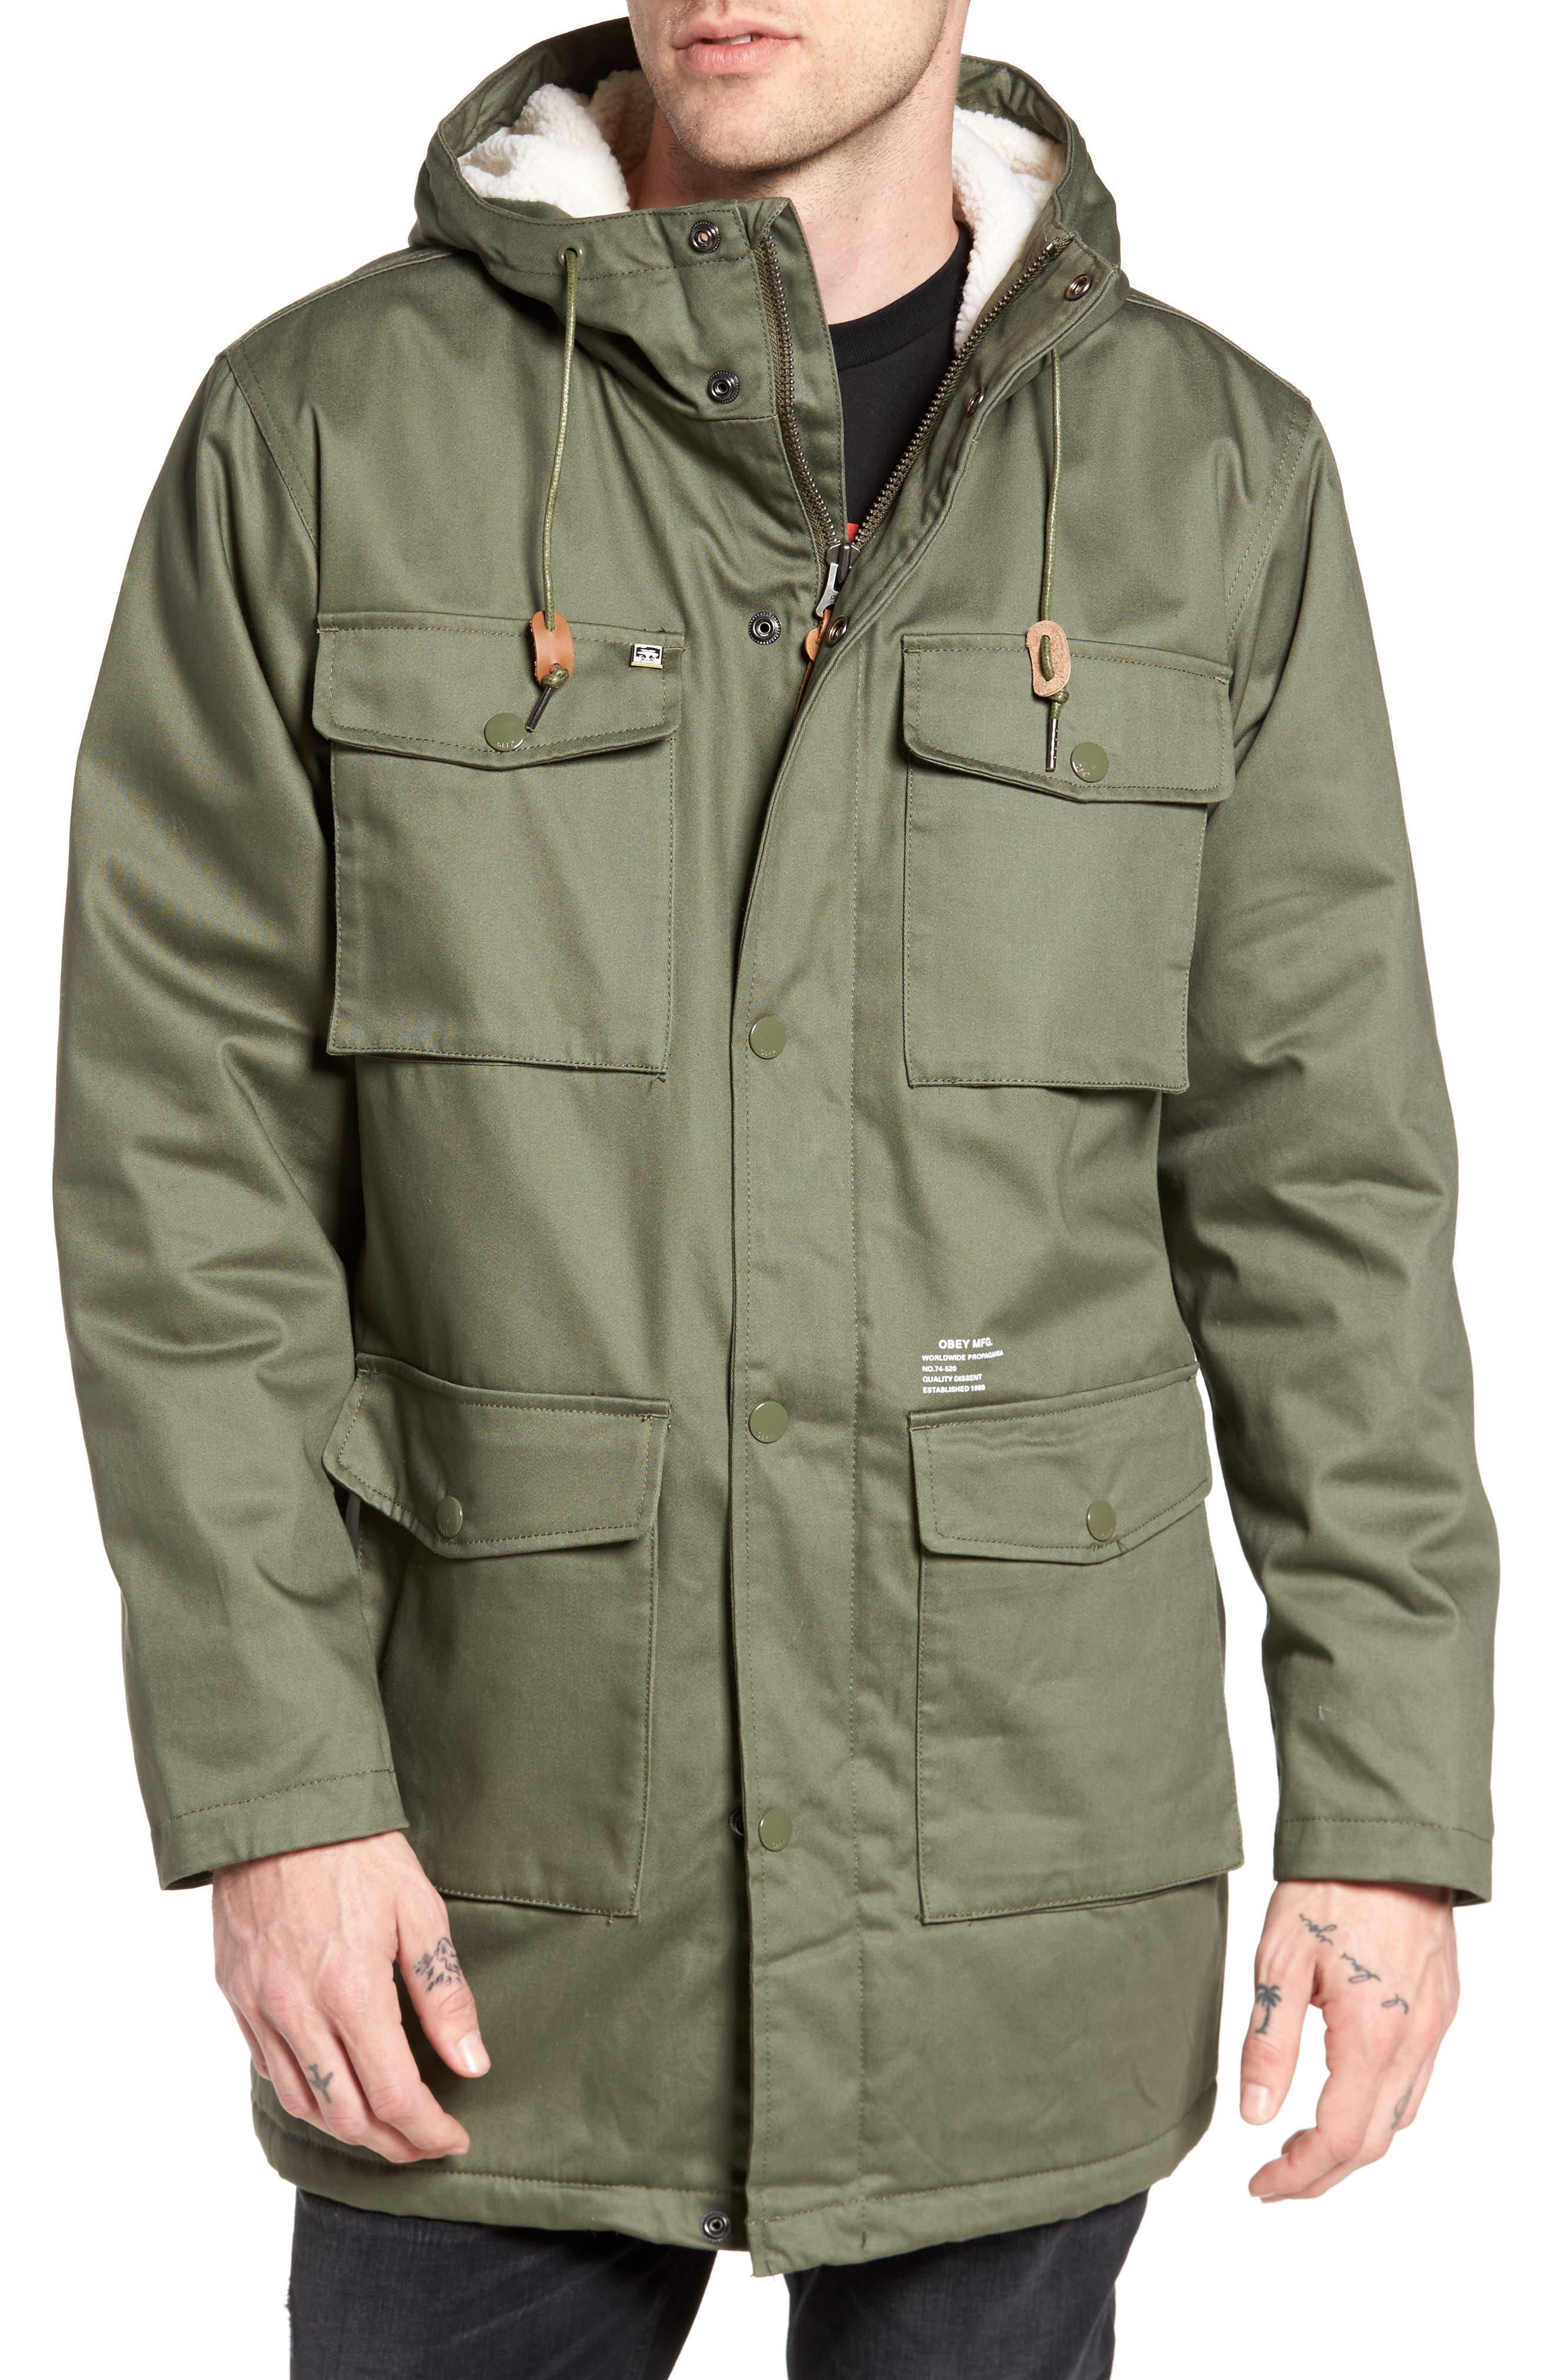 Heller II Jacket,                             Alternate thumbnail 4, color,                             Army